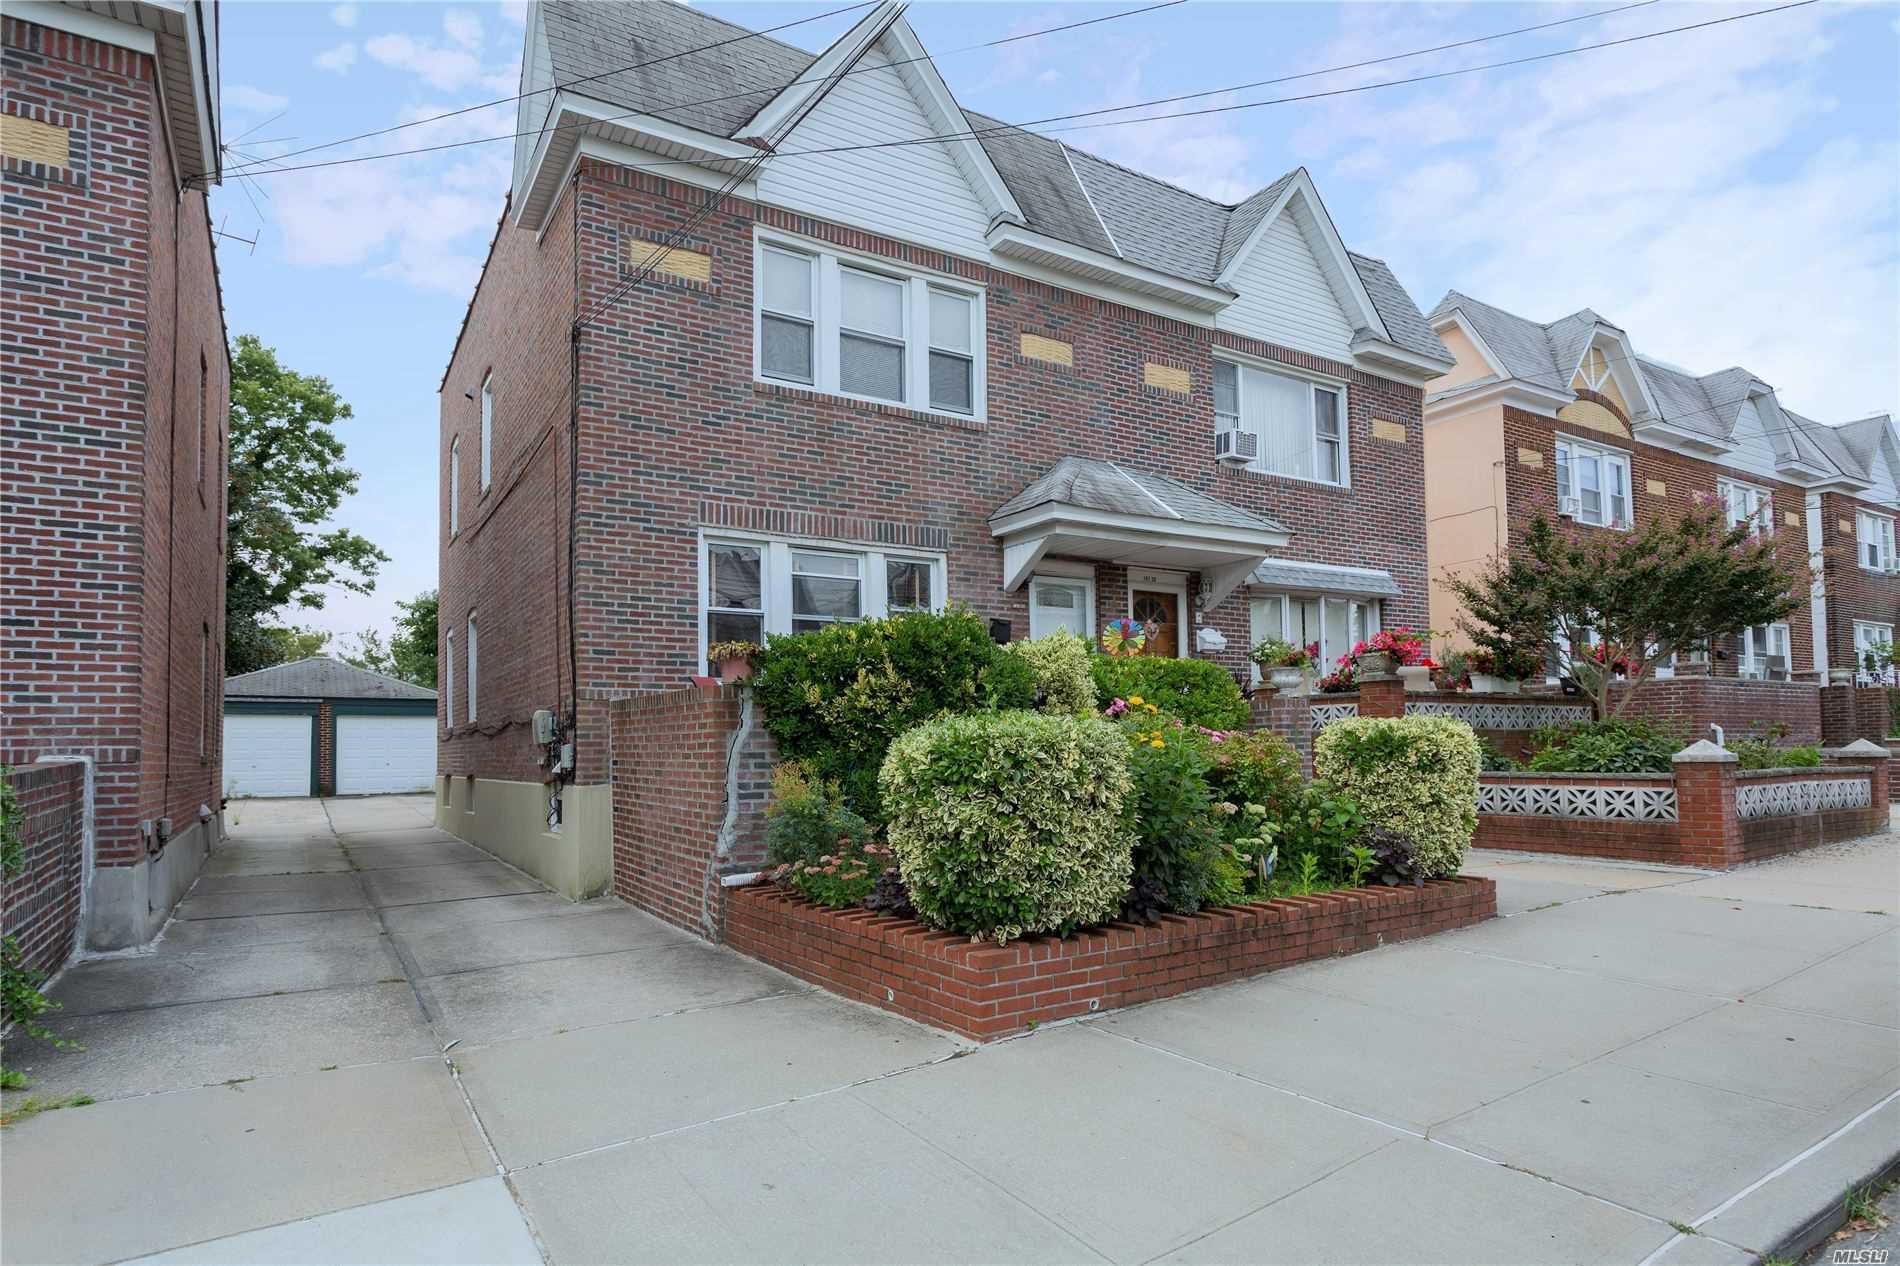 Property for sale at 147-40 24th Avenue, Whitestone NY 11357, Whitestone,  New York 11357